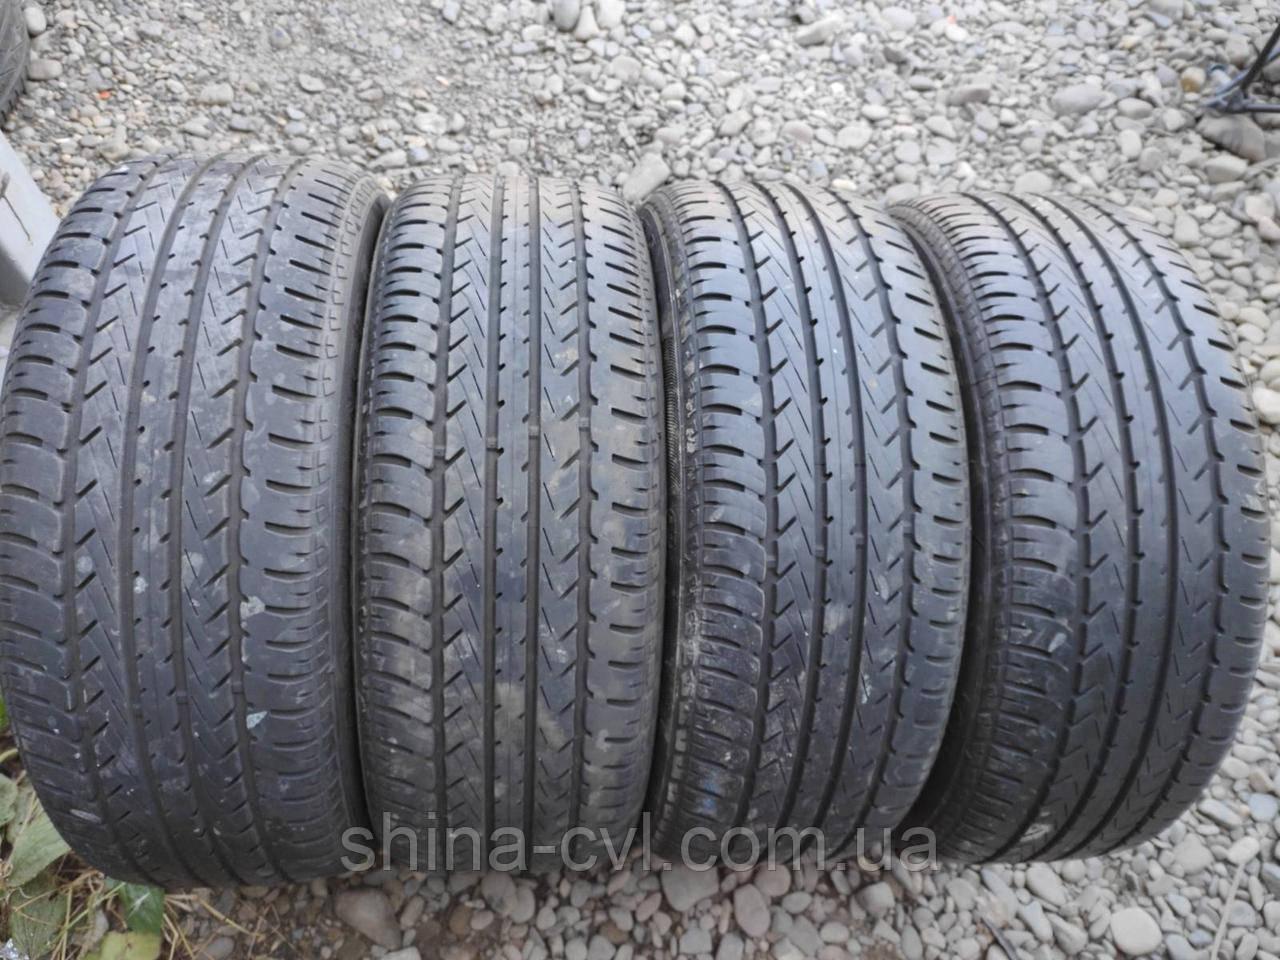 Літні шини 215/50 R17 91V GOODYEAR EAGLE NCT5